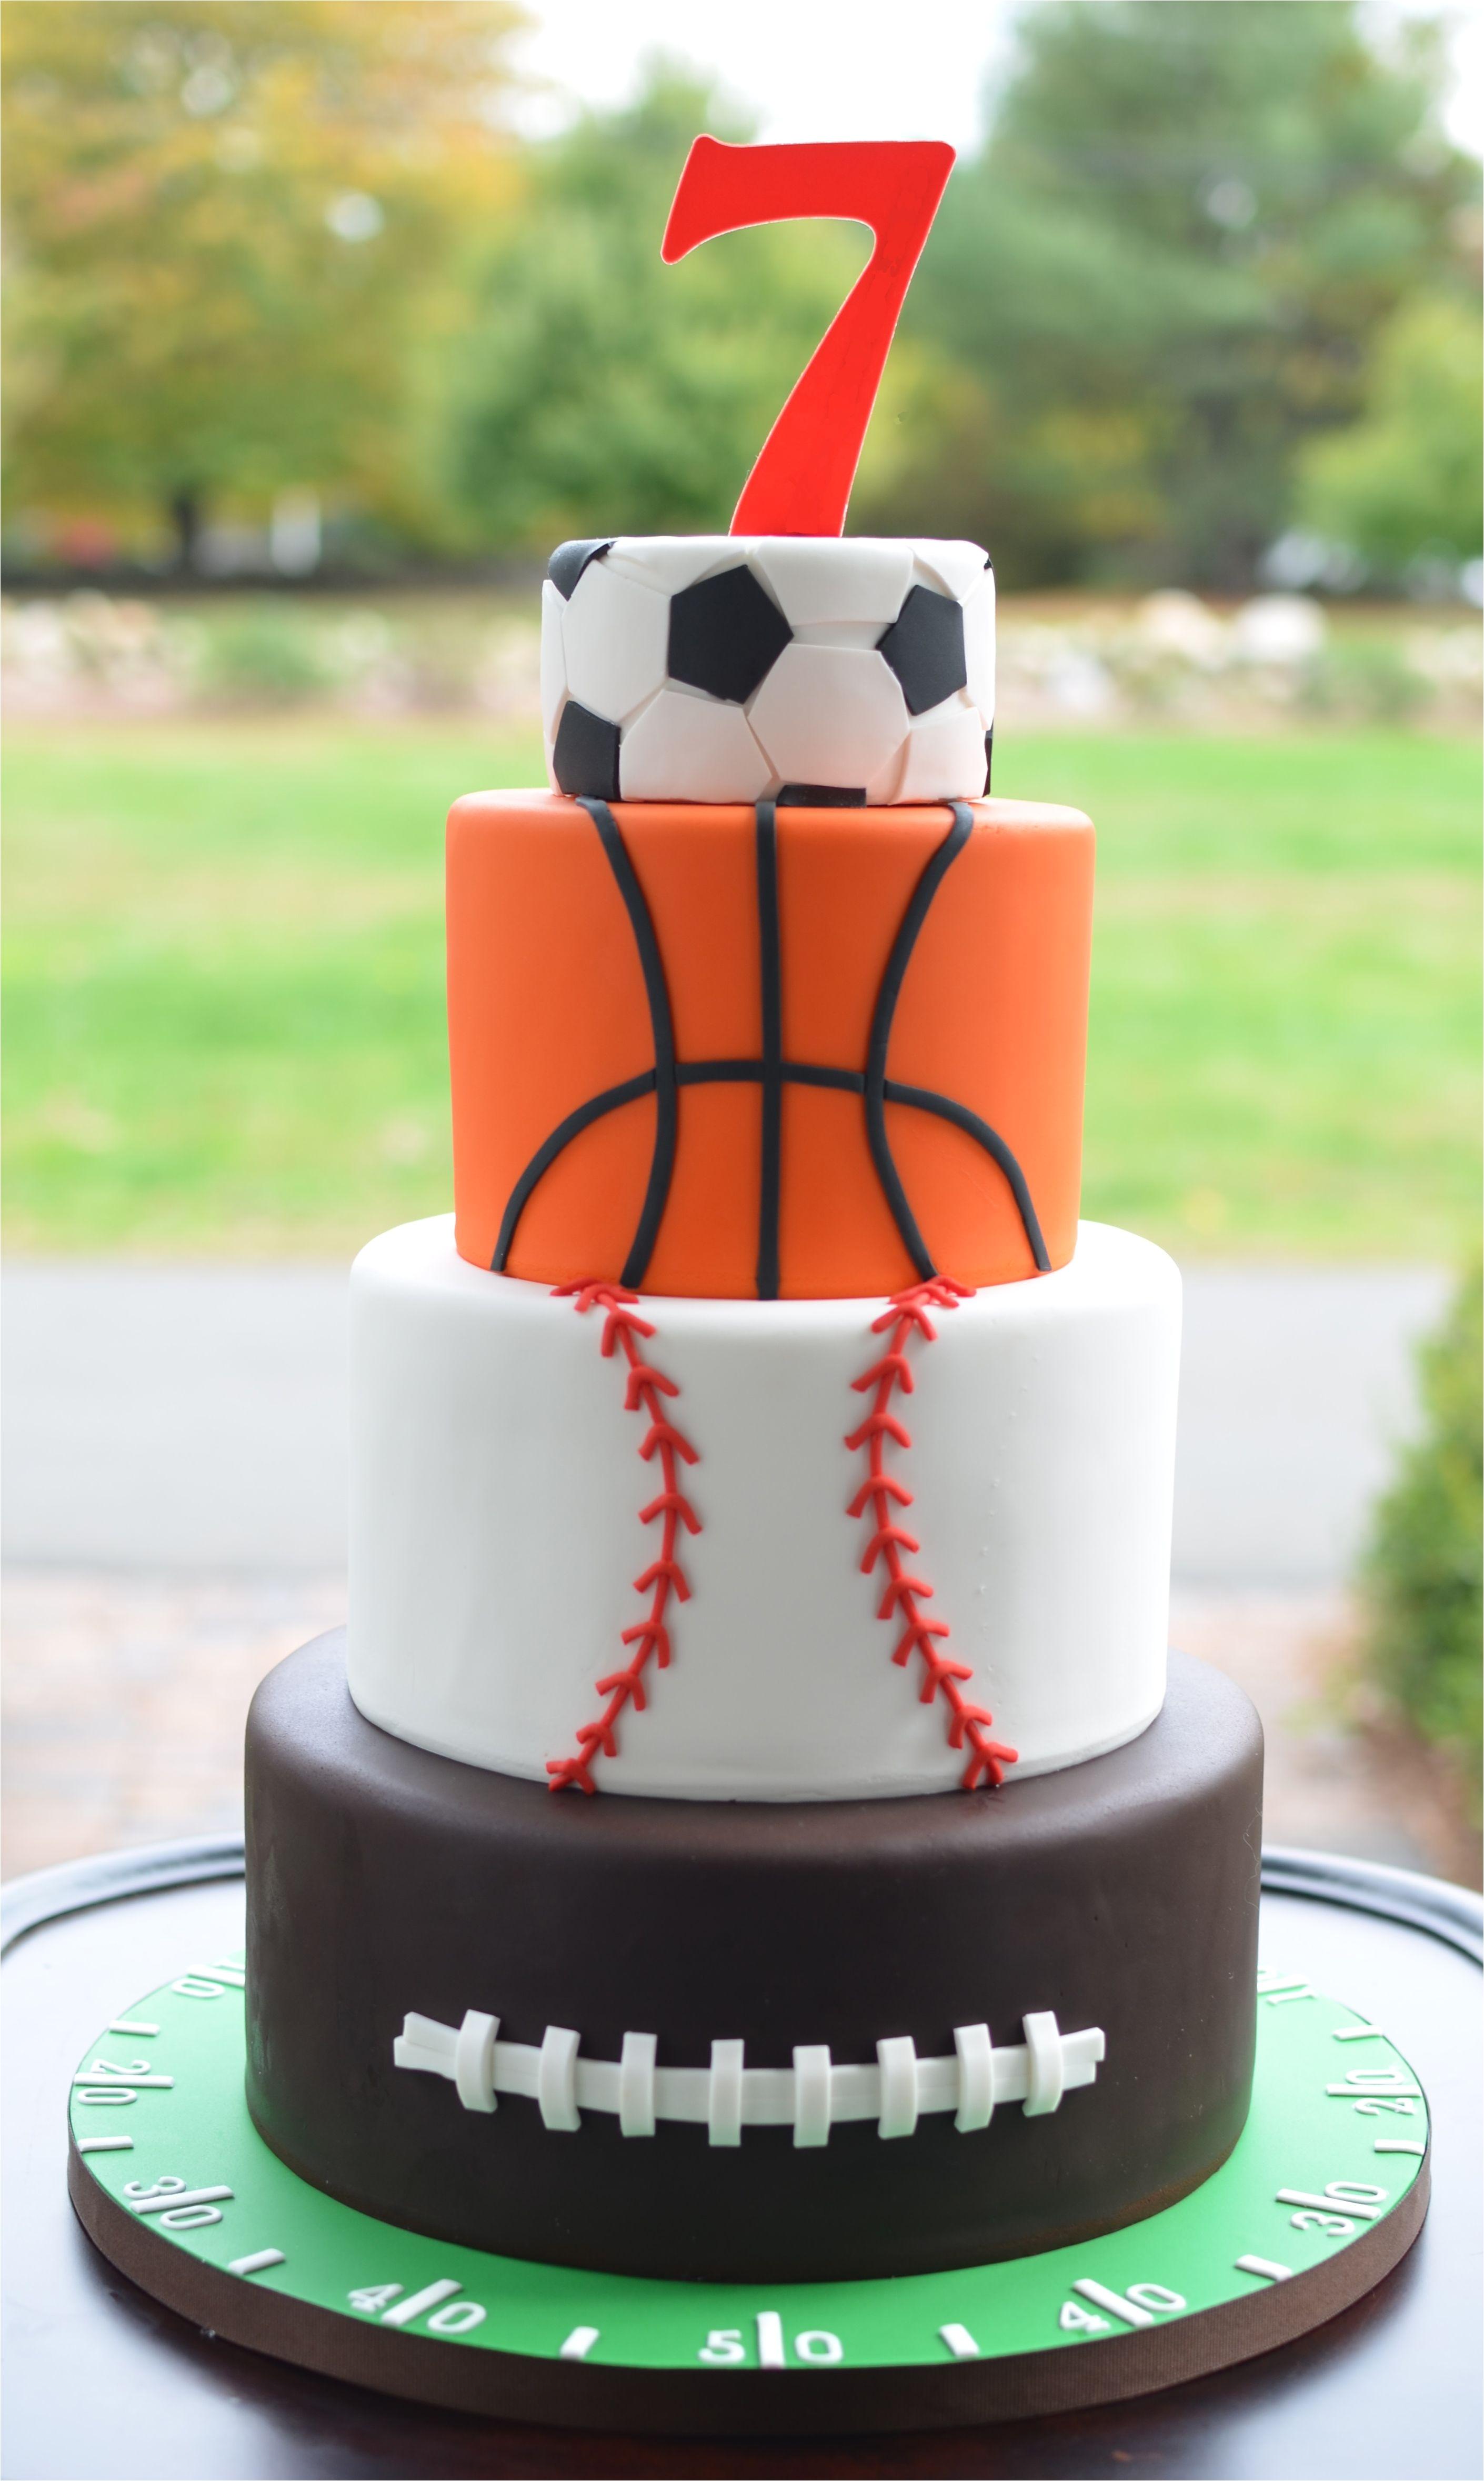 Baseball Cake Decorations All Star Sports themed Birthday Cake but A Dream Custom Cakes